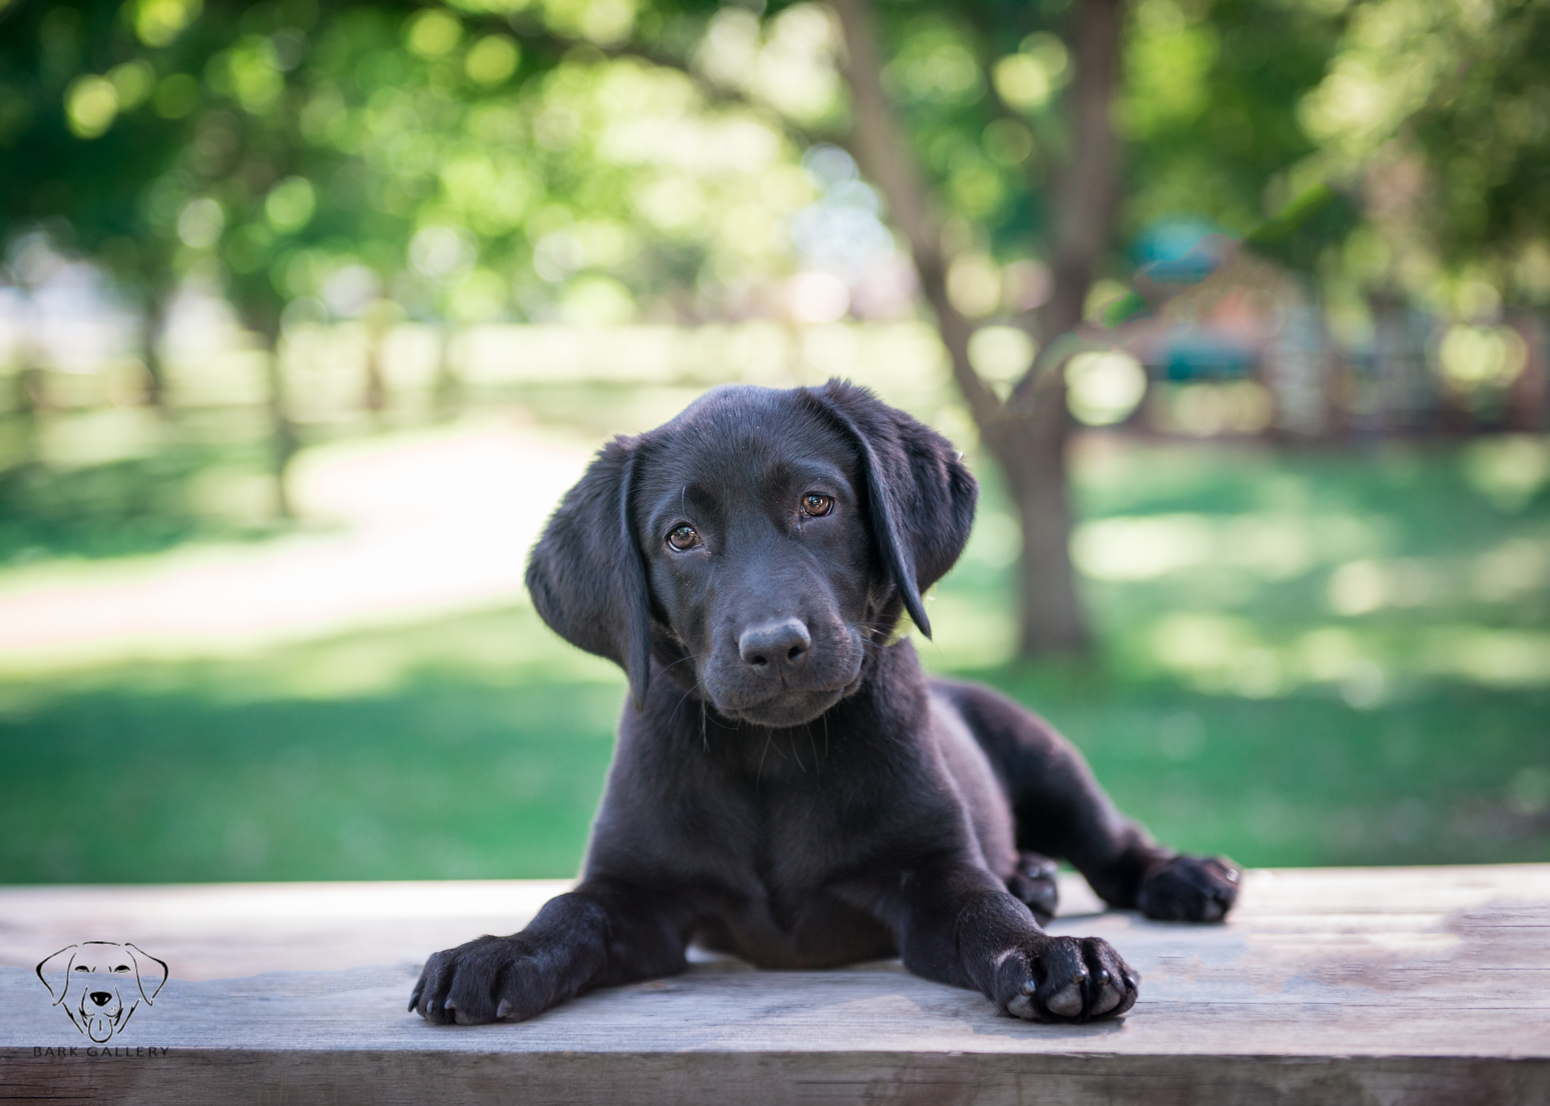 labrador-dog-photograph-portrait-vierkandt